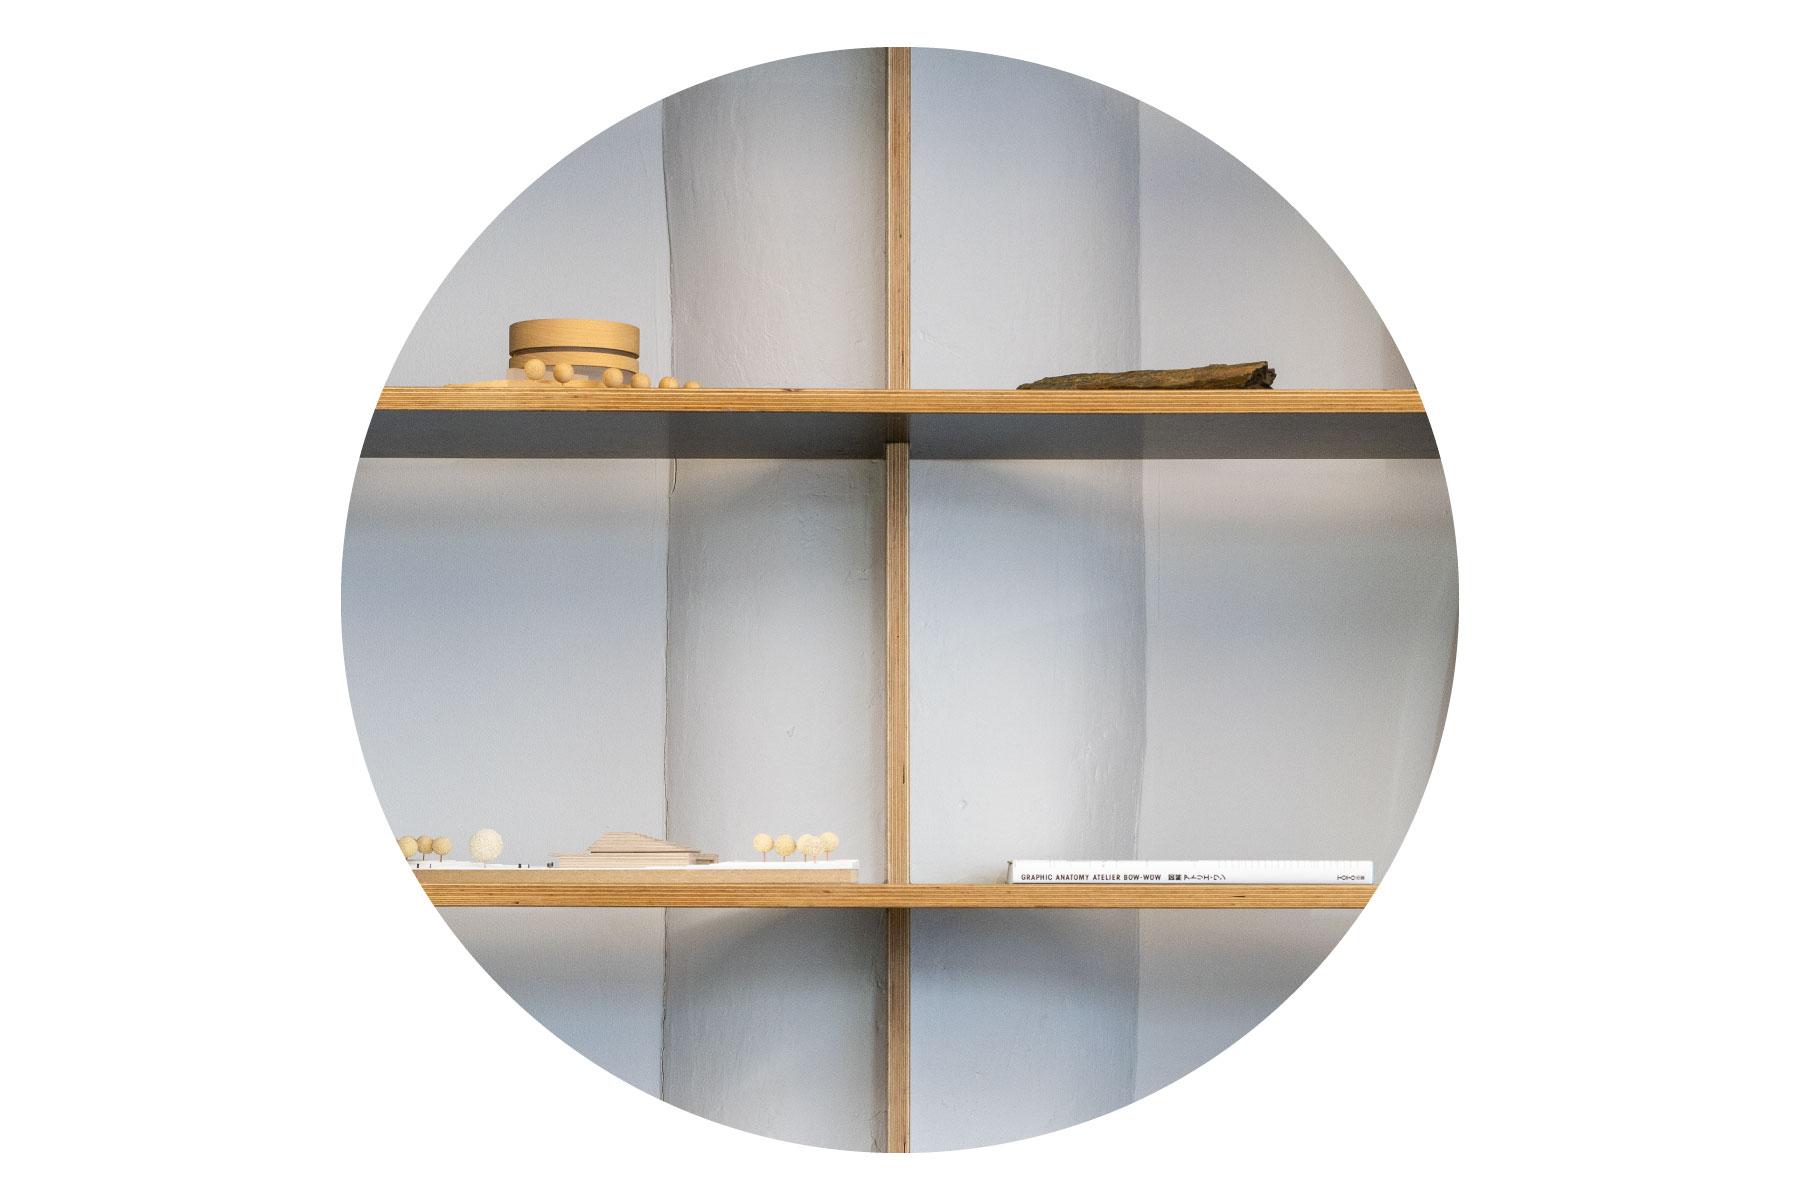 STUDIOKUBIK-KUBIK-architektur-architecture-berlin-umbau-buero-office_7